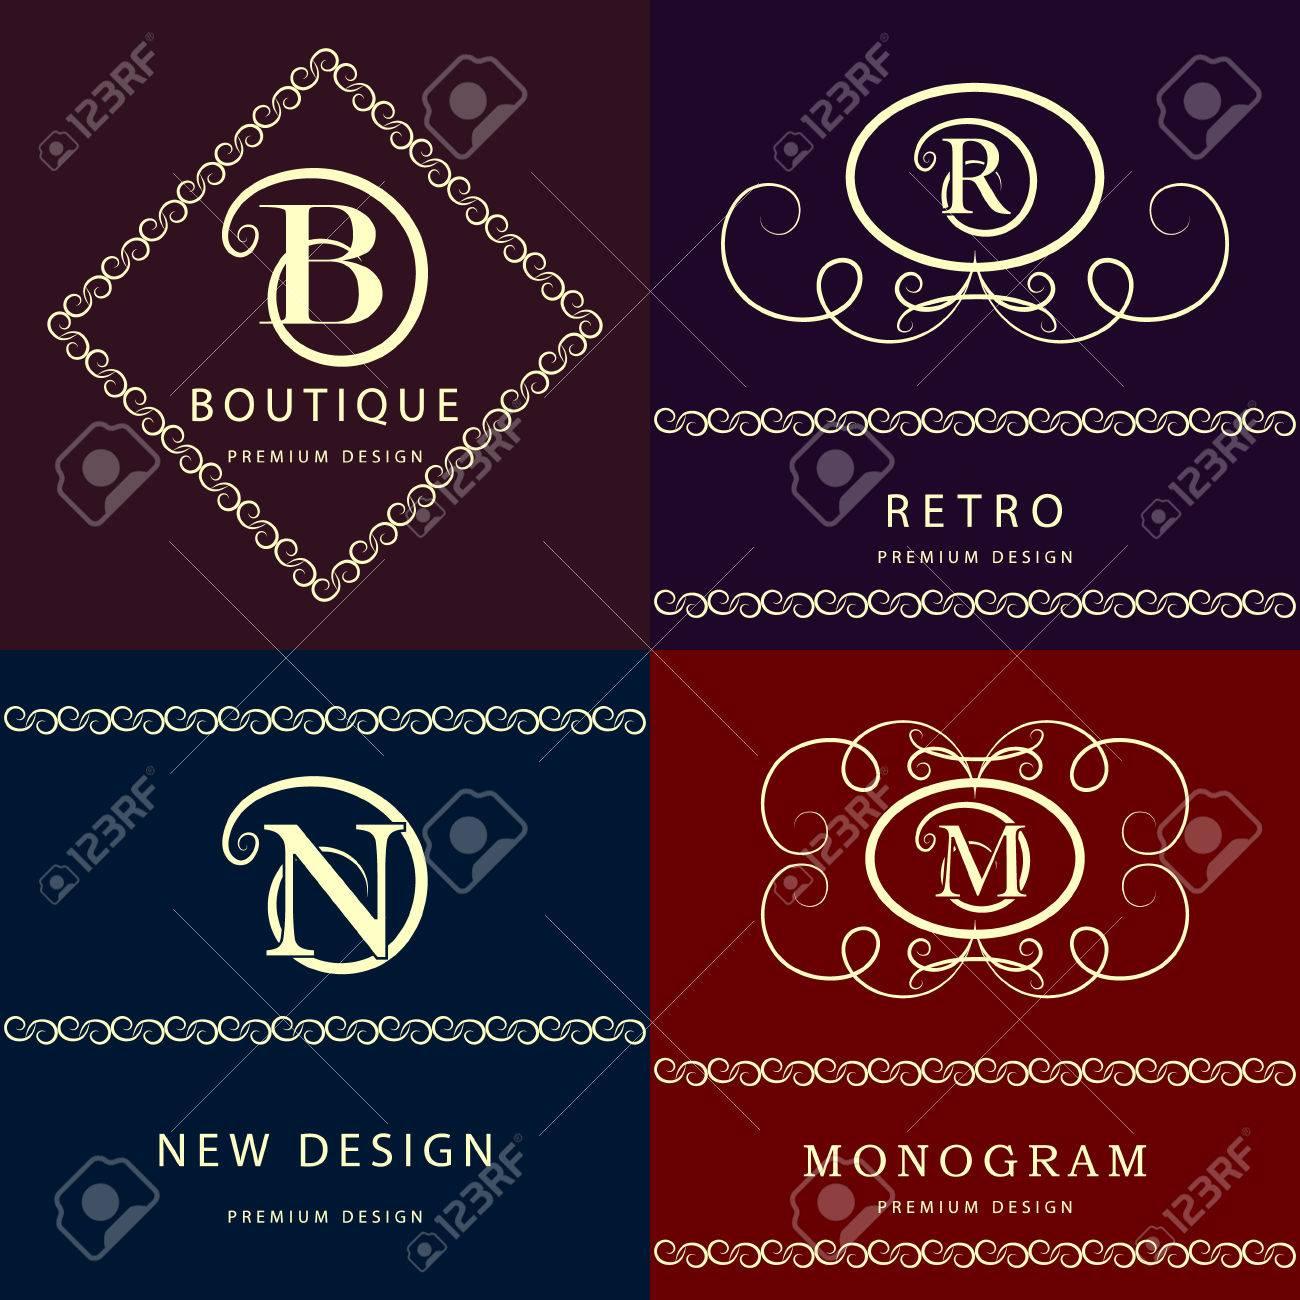 Tj initial luxury ornament monogram logo stock vector - M Monogram Vector Illustration Of Monogram Design Elements Graceful Template Elegant Line Art